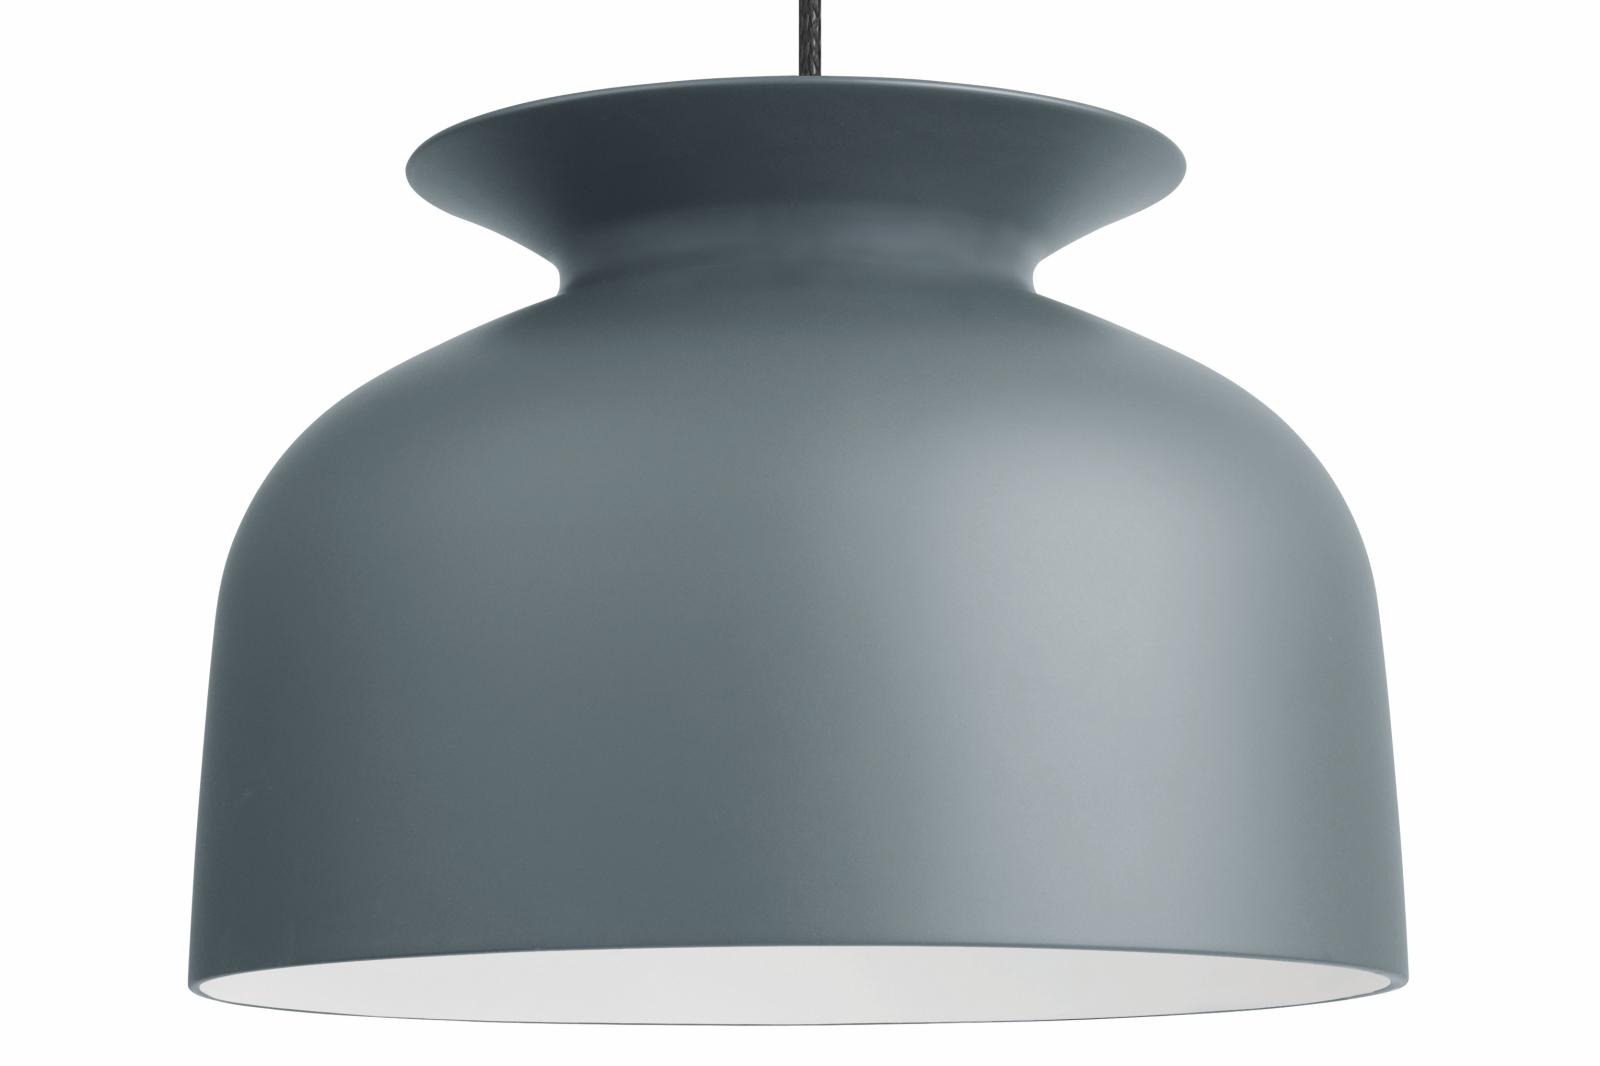 Ronde Pendant Light Gubi Metal Pigeon Grey, 040